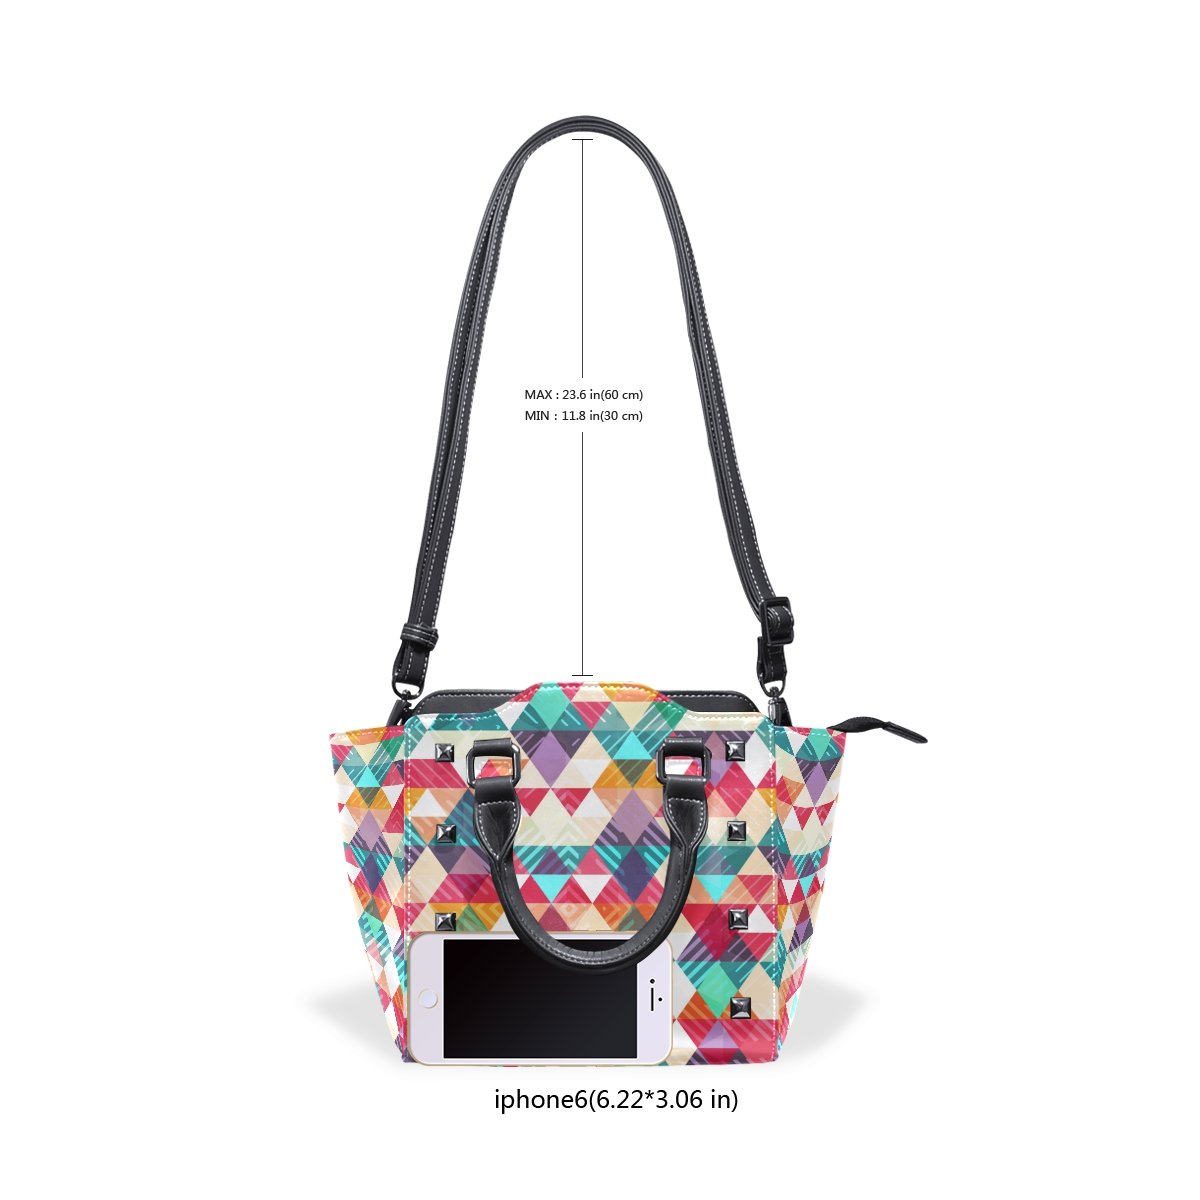 Womens Top Handle Satchel Handbag Vintage Colorful Triangle Ladies PU Leather Shoulder Bag Crossbody Bag